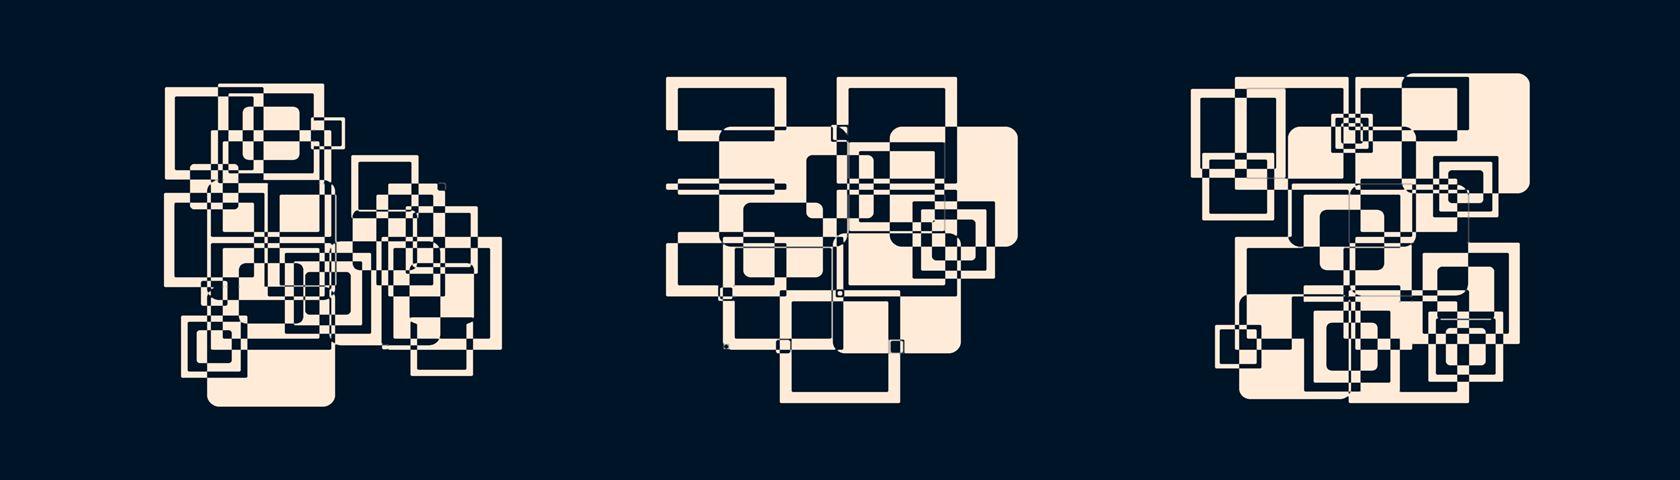 Polygonal 2